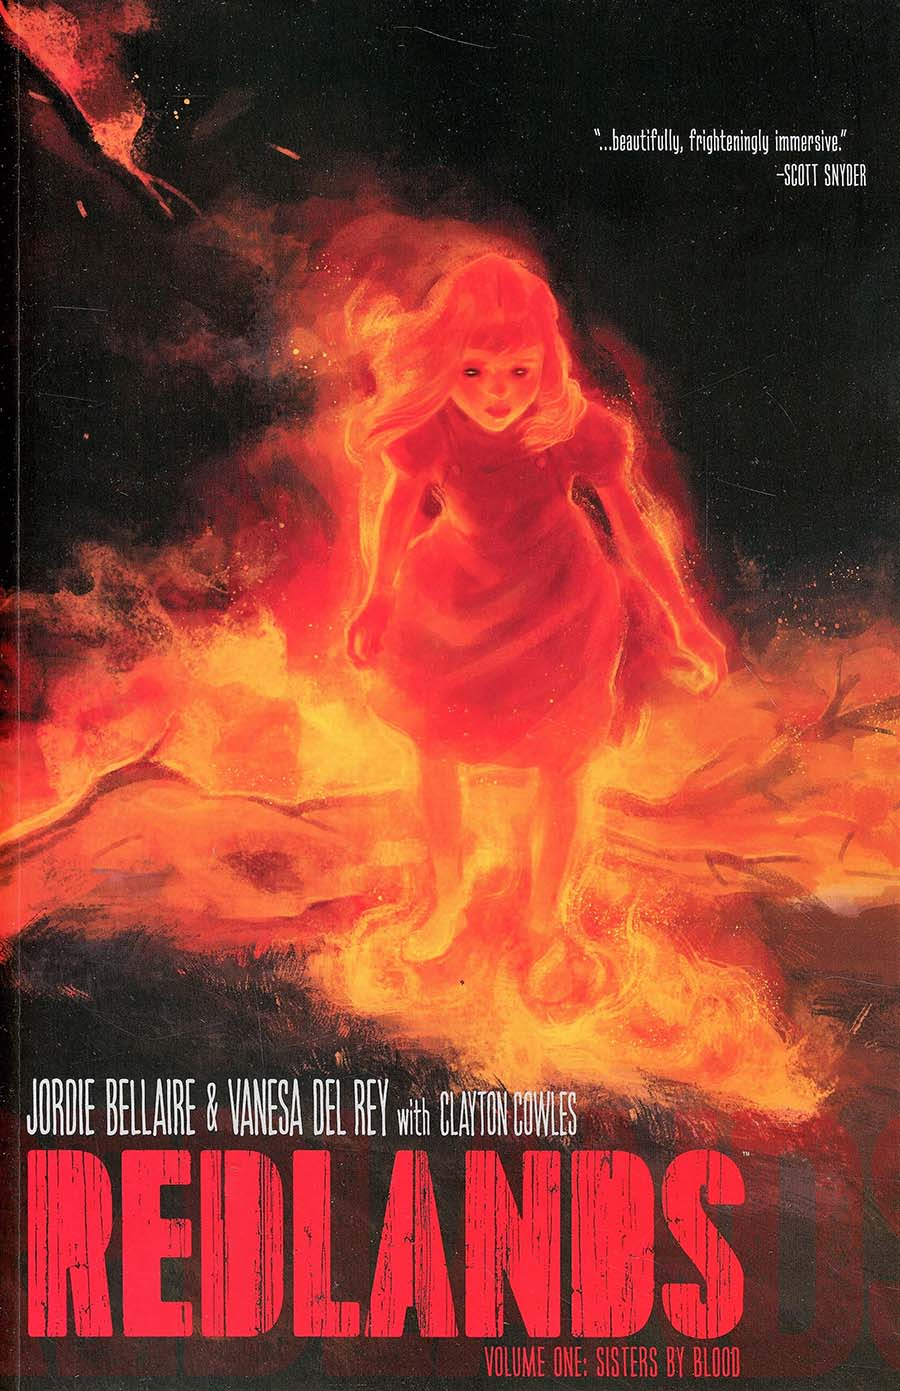 Redlands Vol 1 Sisters By Blood TP